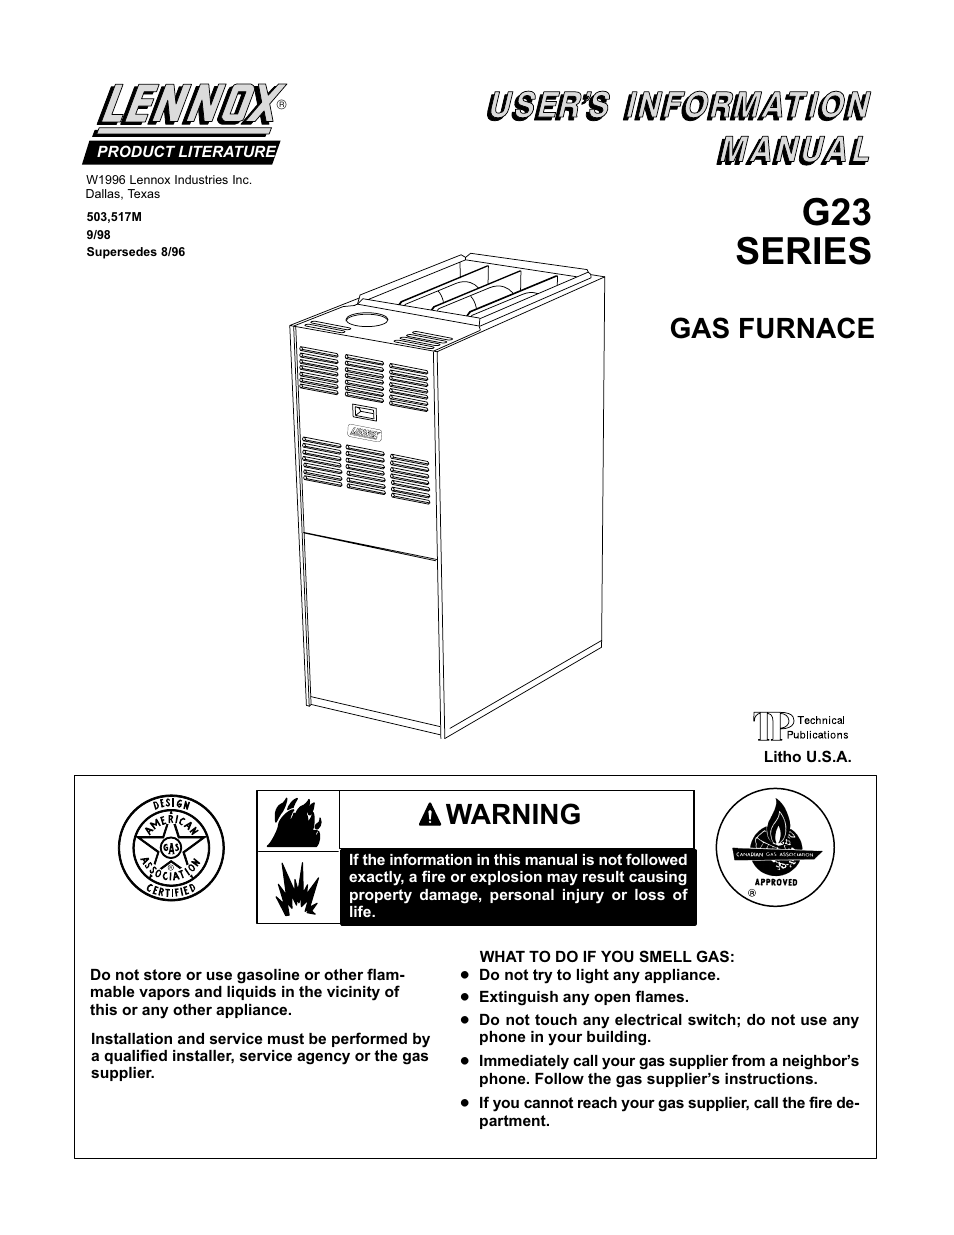 medium resolution of lennox g23 wiring diagram